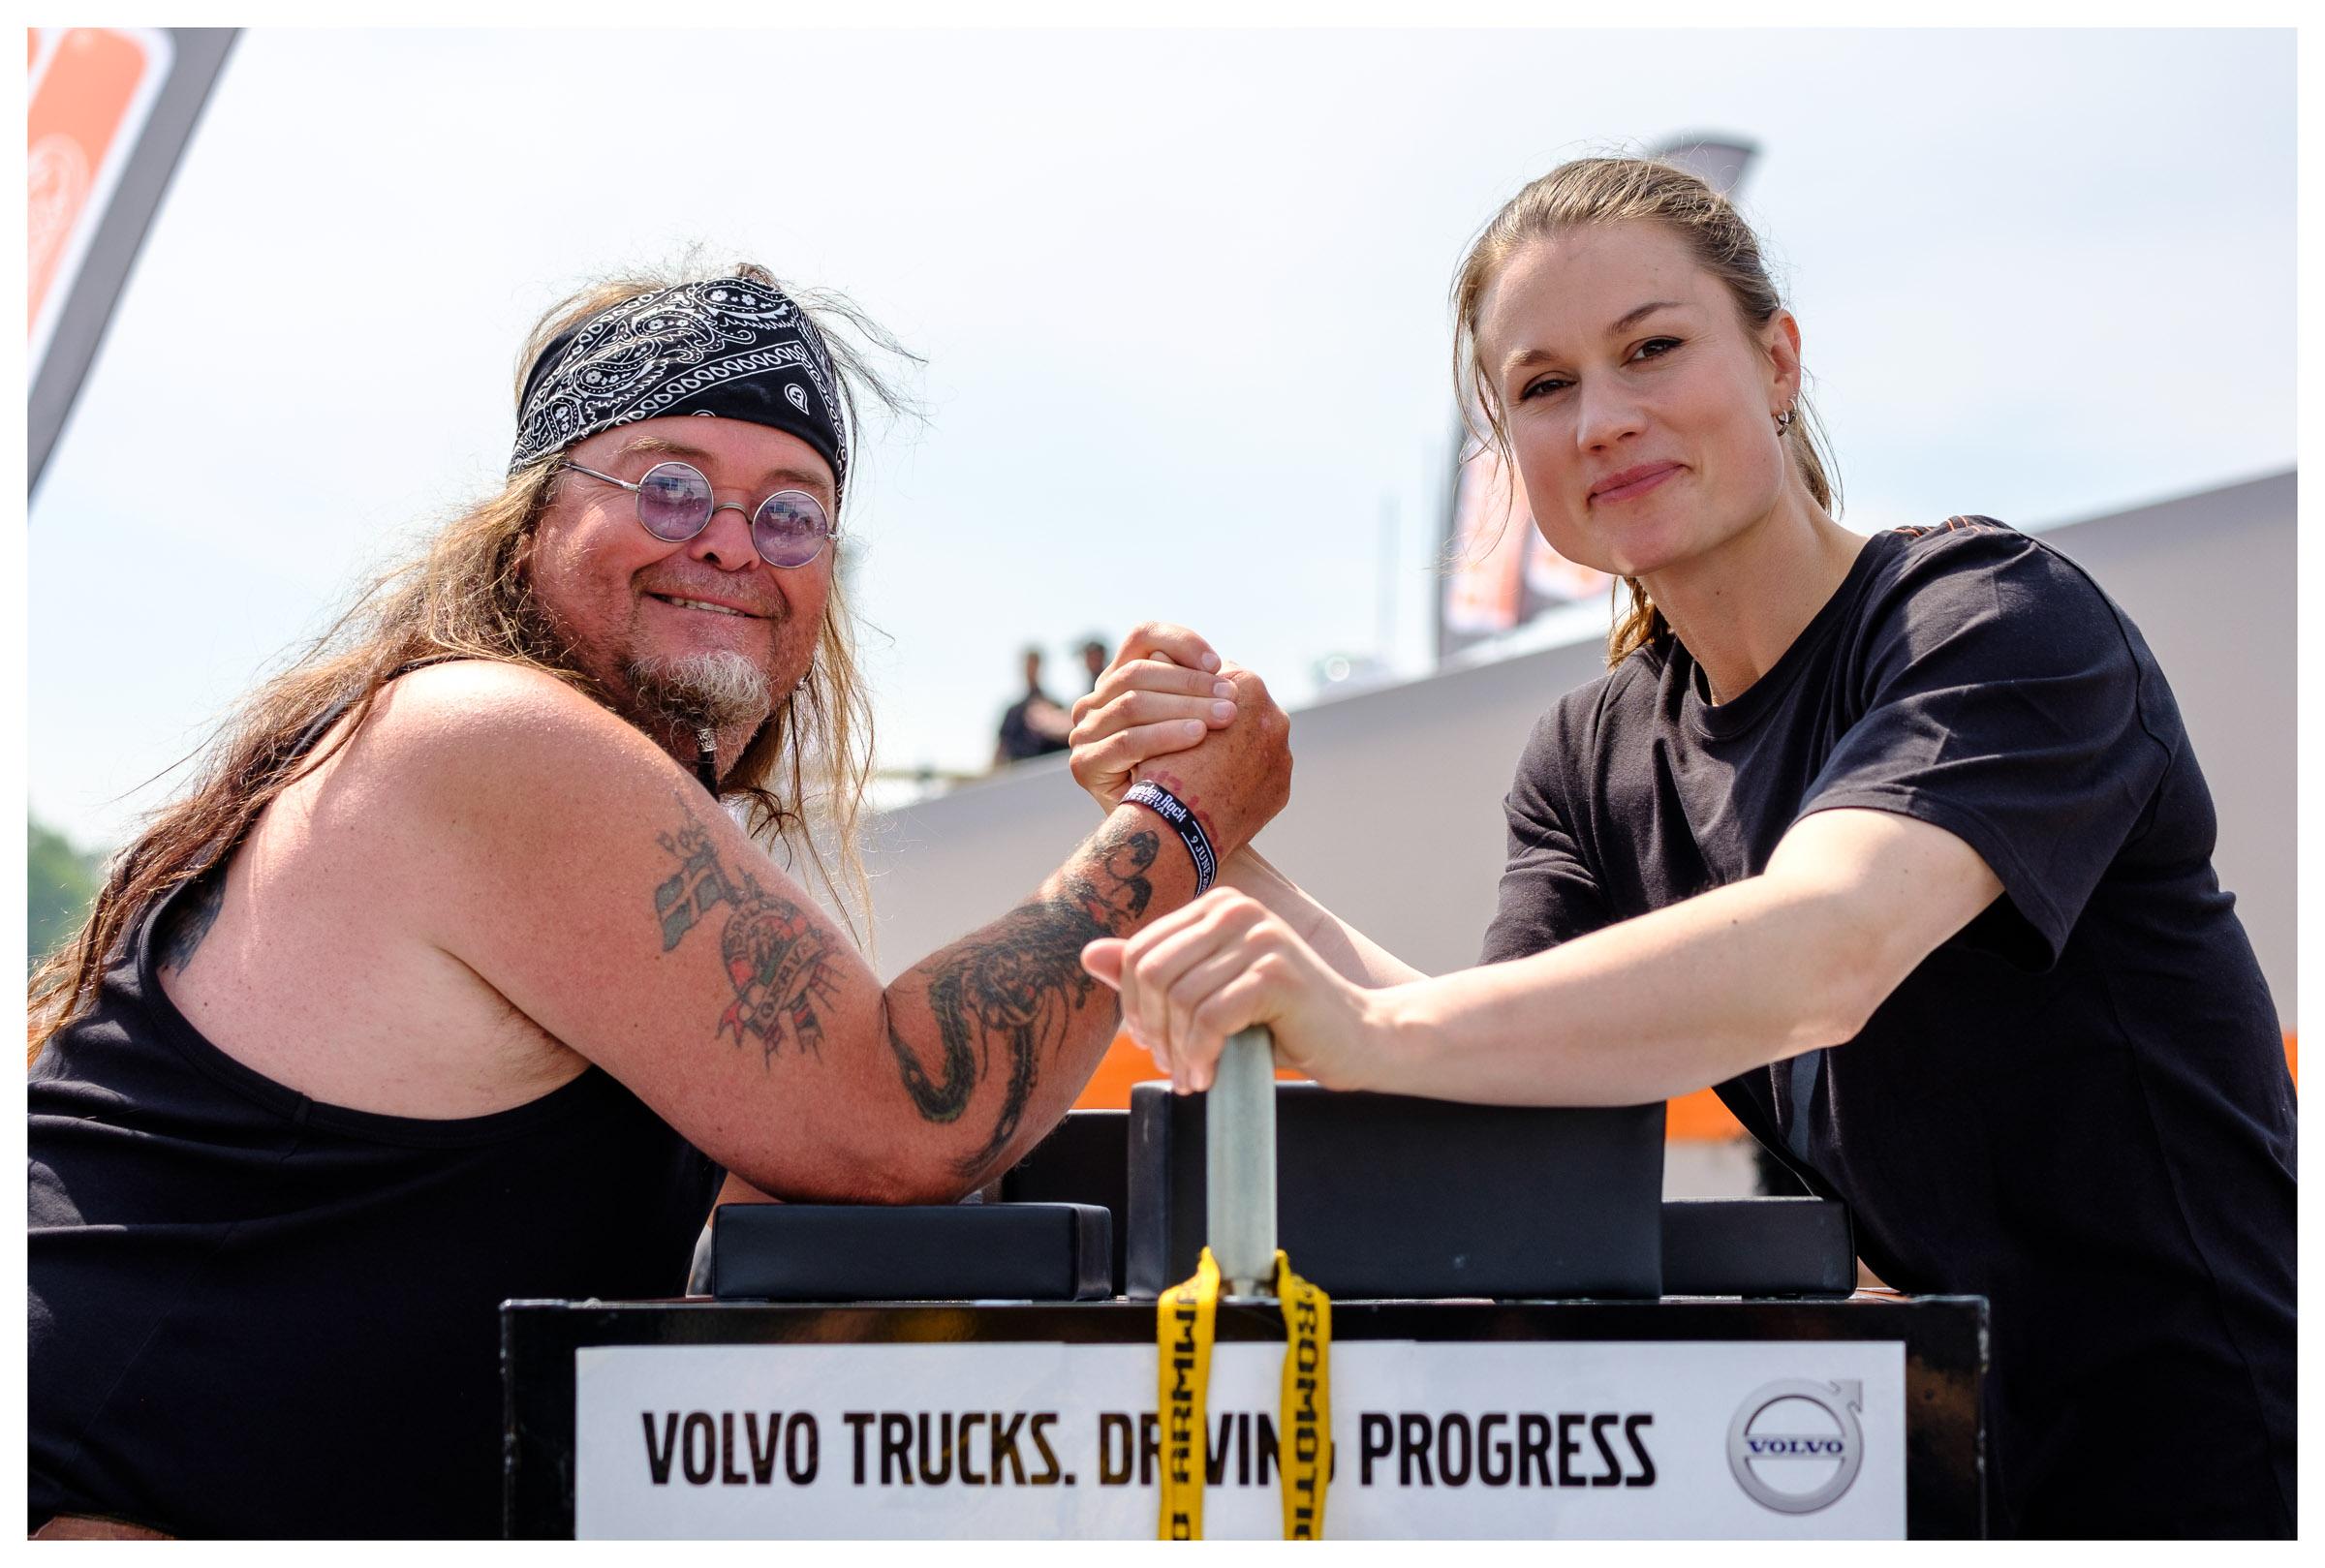 Heidi Andersson posing with fan